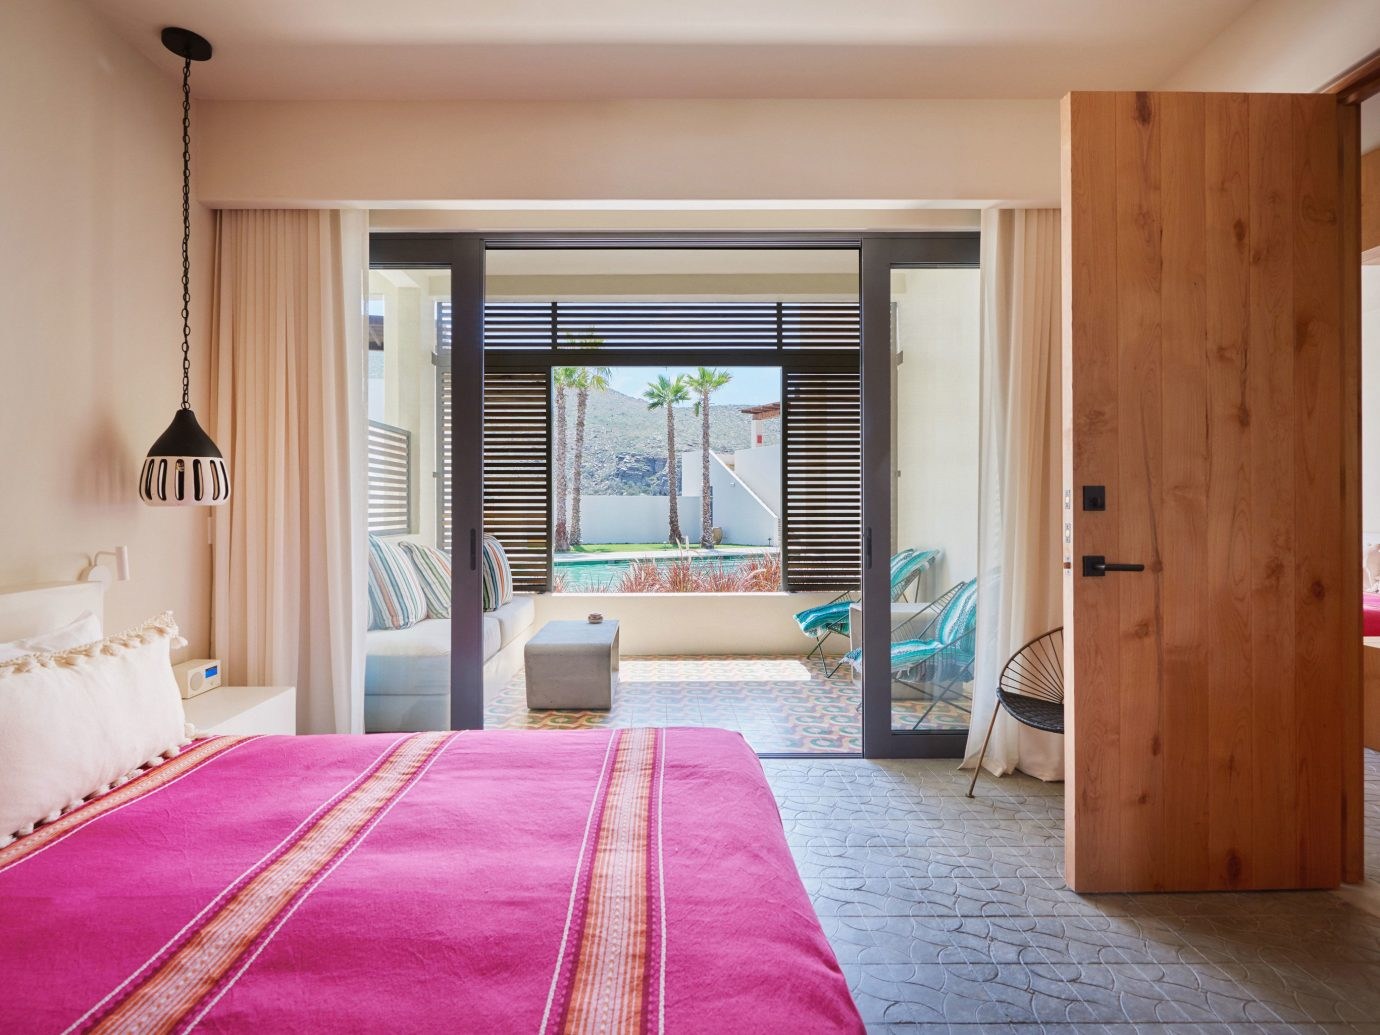 Beach Honeymoon Hotels Mexico Romance Tulum indoor wall window bed floor room property Bedroom interior design Suite estate cottage real estate apartment furniture